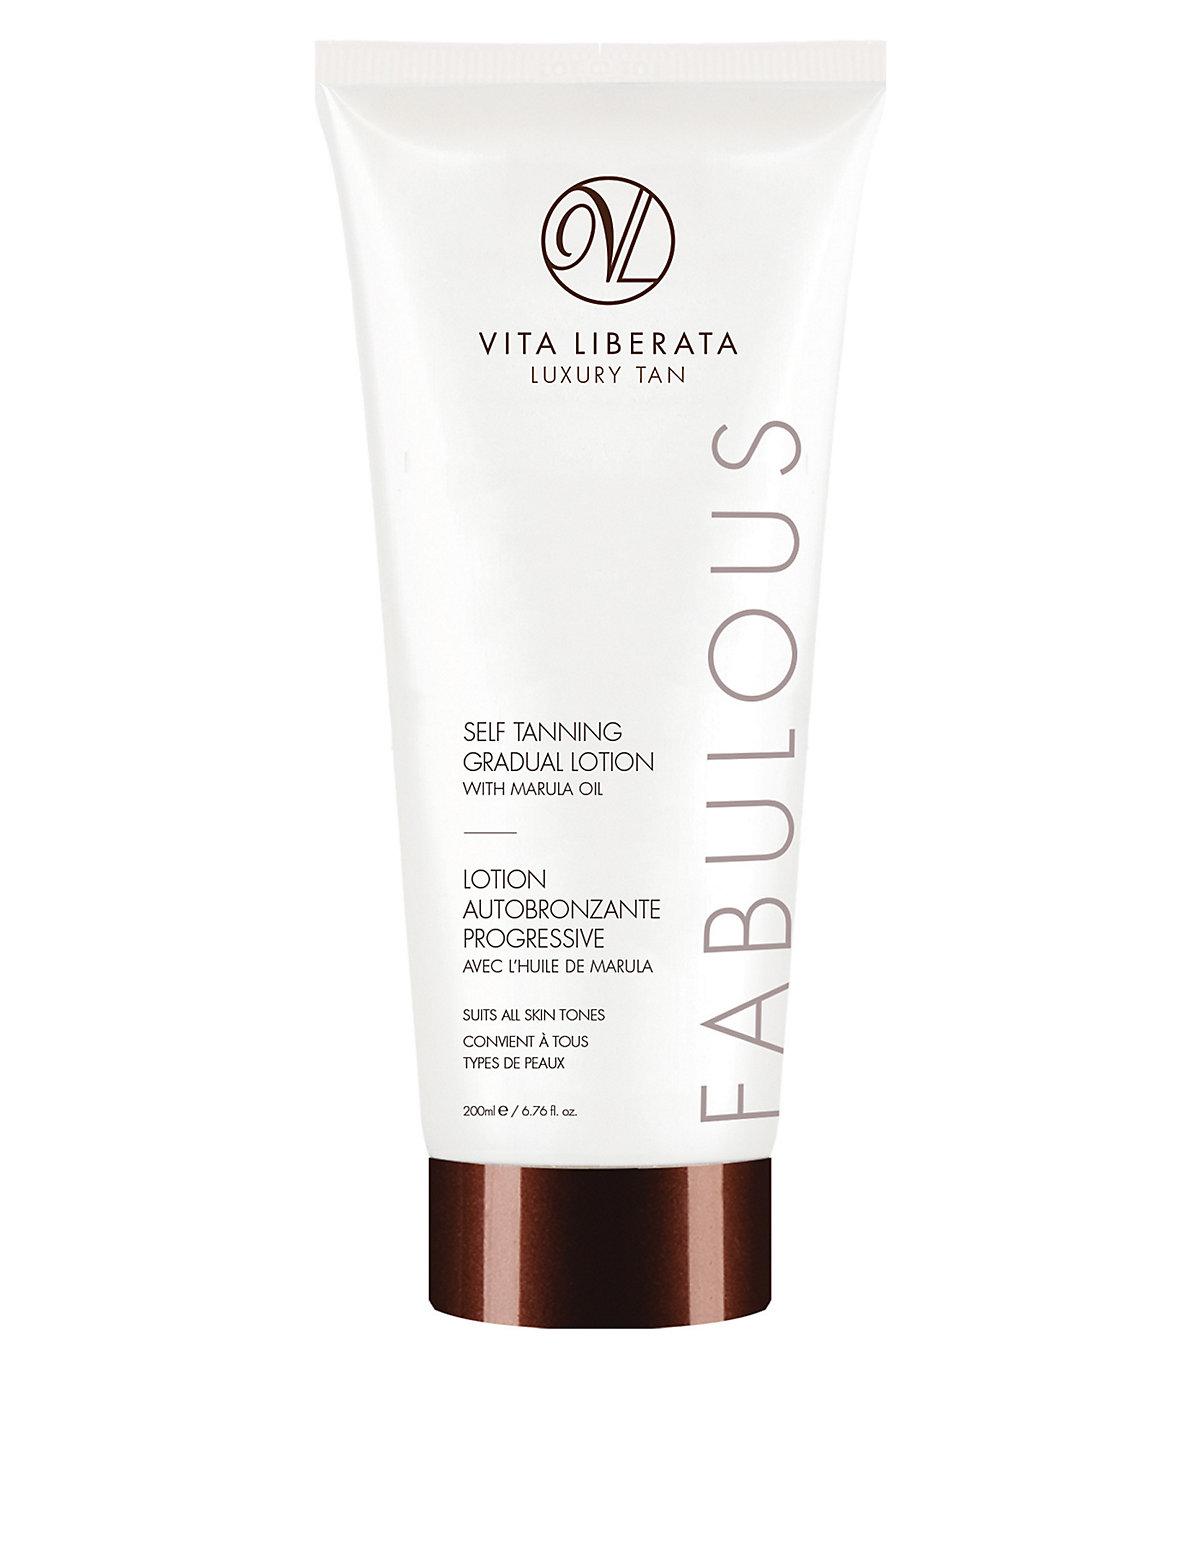 Vita Liberata Fabulous Self Tanning Gradual Lotion with Marula Oil 200ml